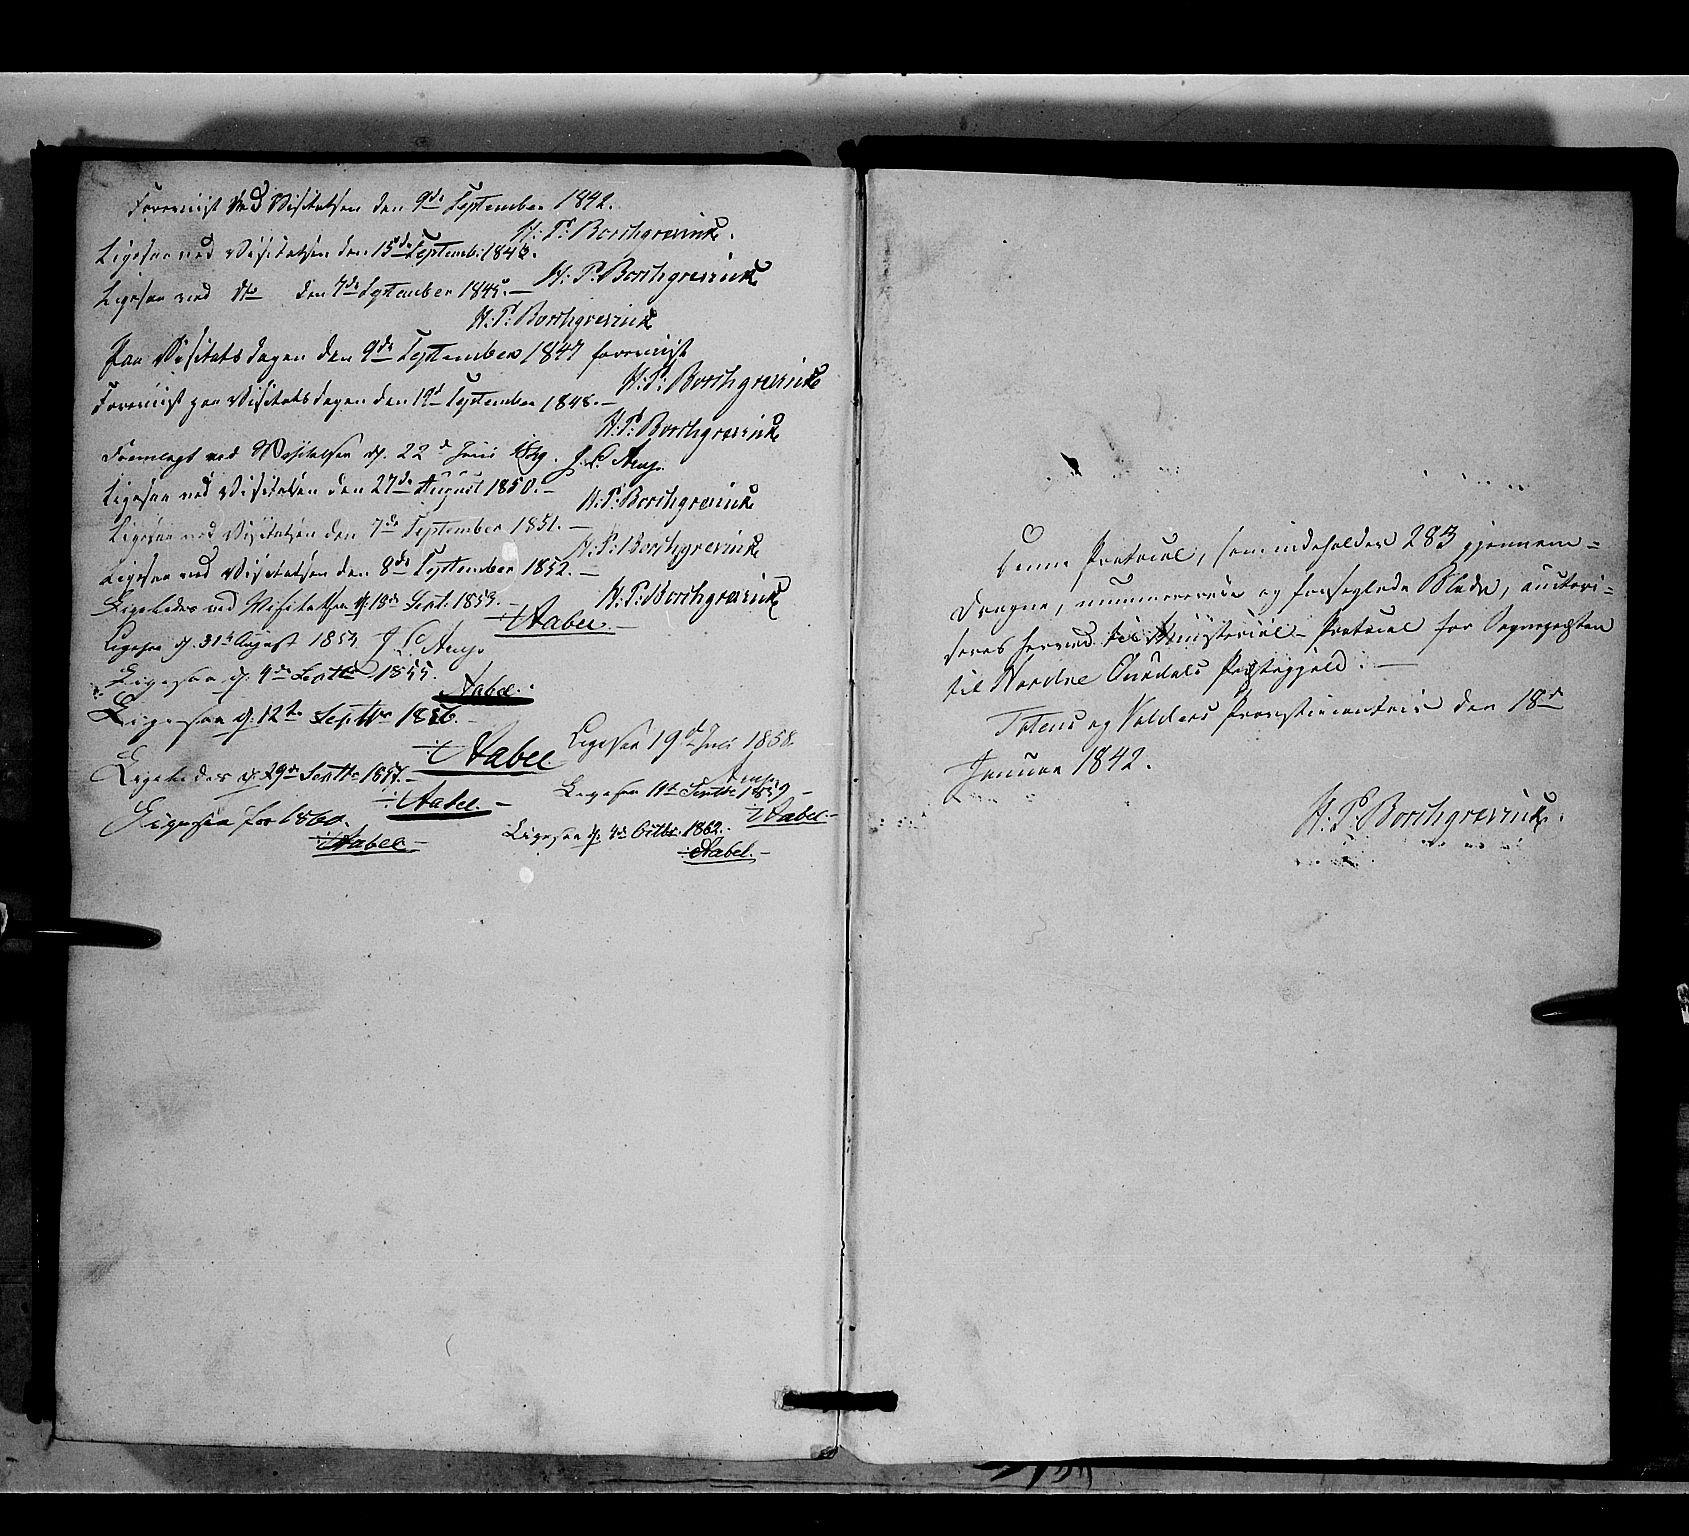 SAH, Nord-Aurdal prestekontor, Ministerialbok nr. 6, 1842-1863